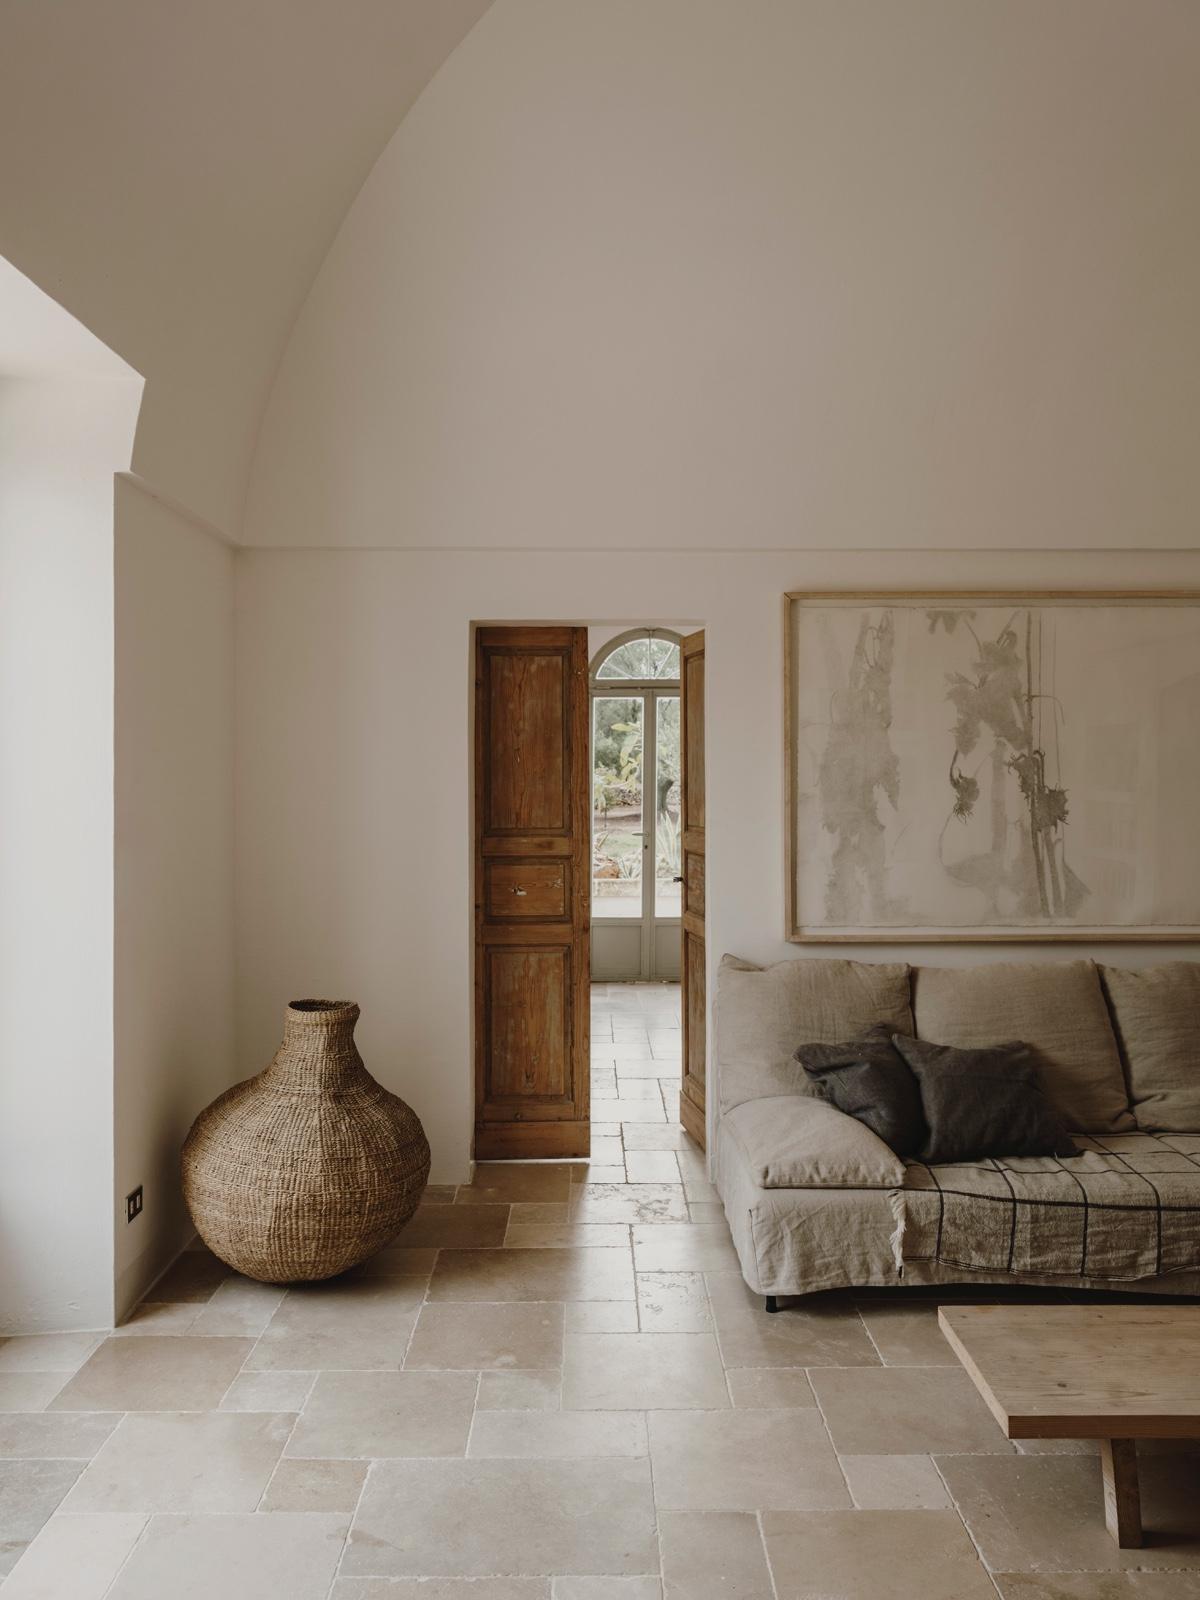 Monochrome interiors-Image-1